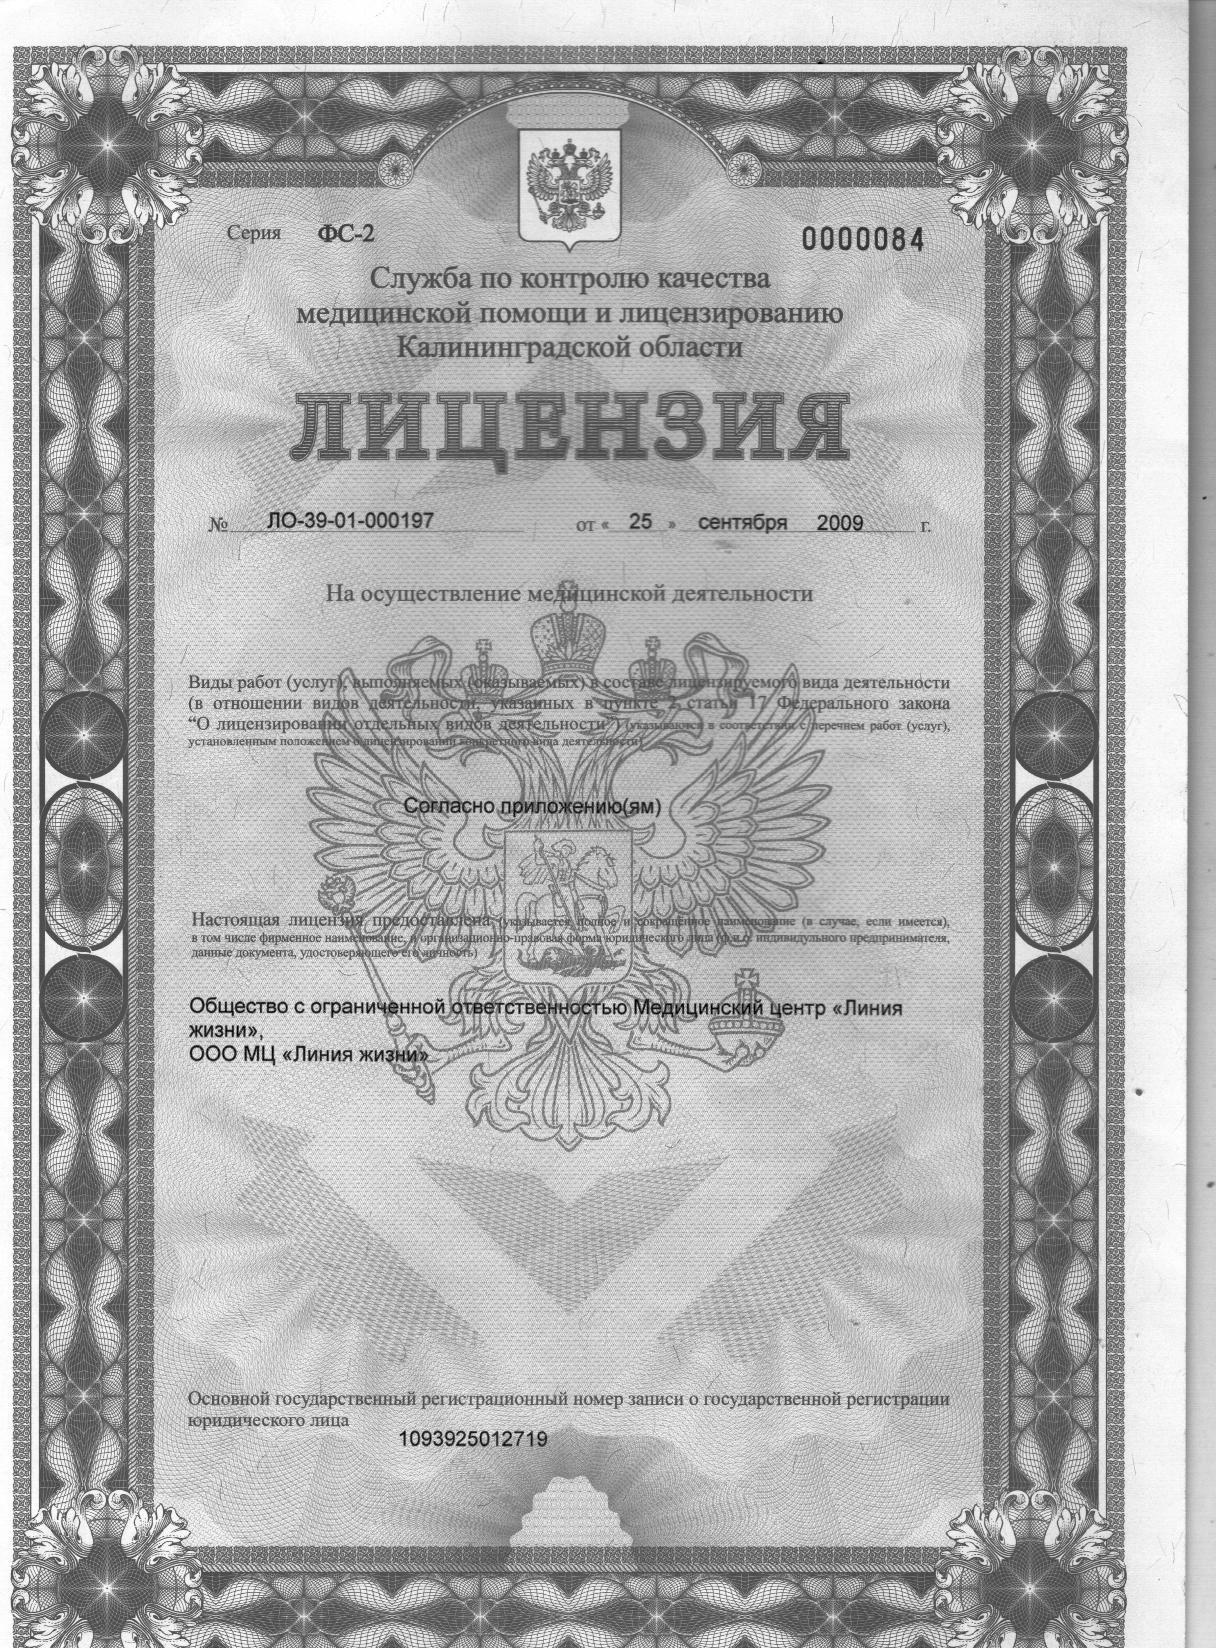 www.liniya-zhizni.com - Лицензия, сертификаты